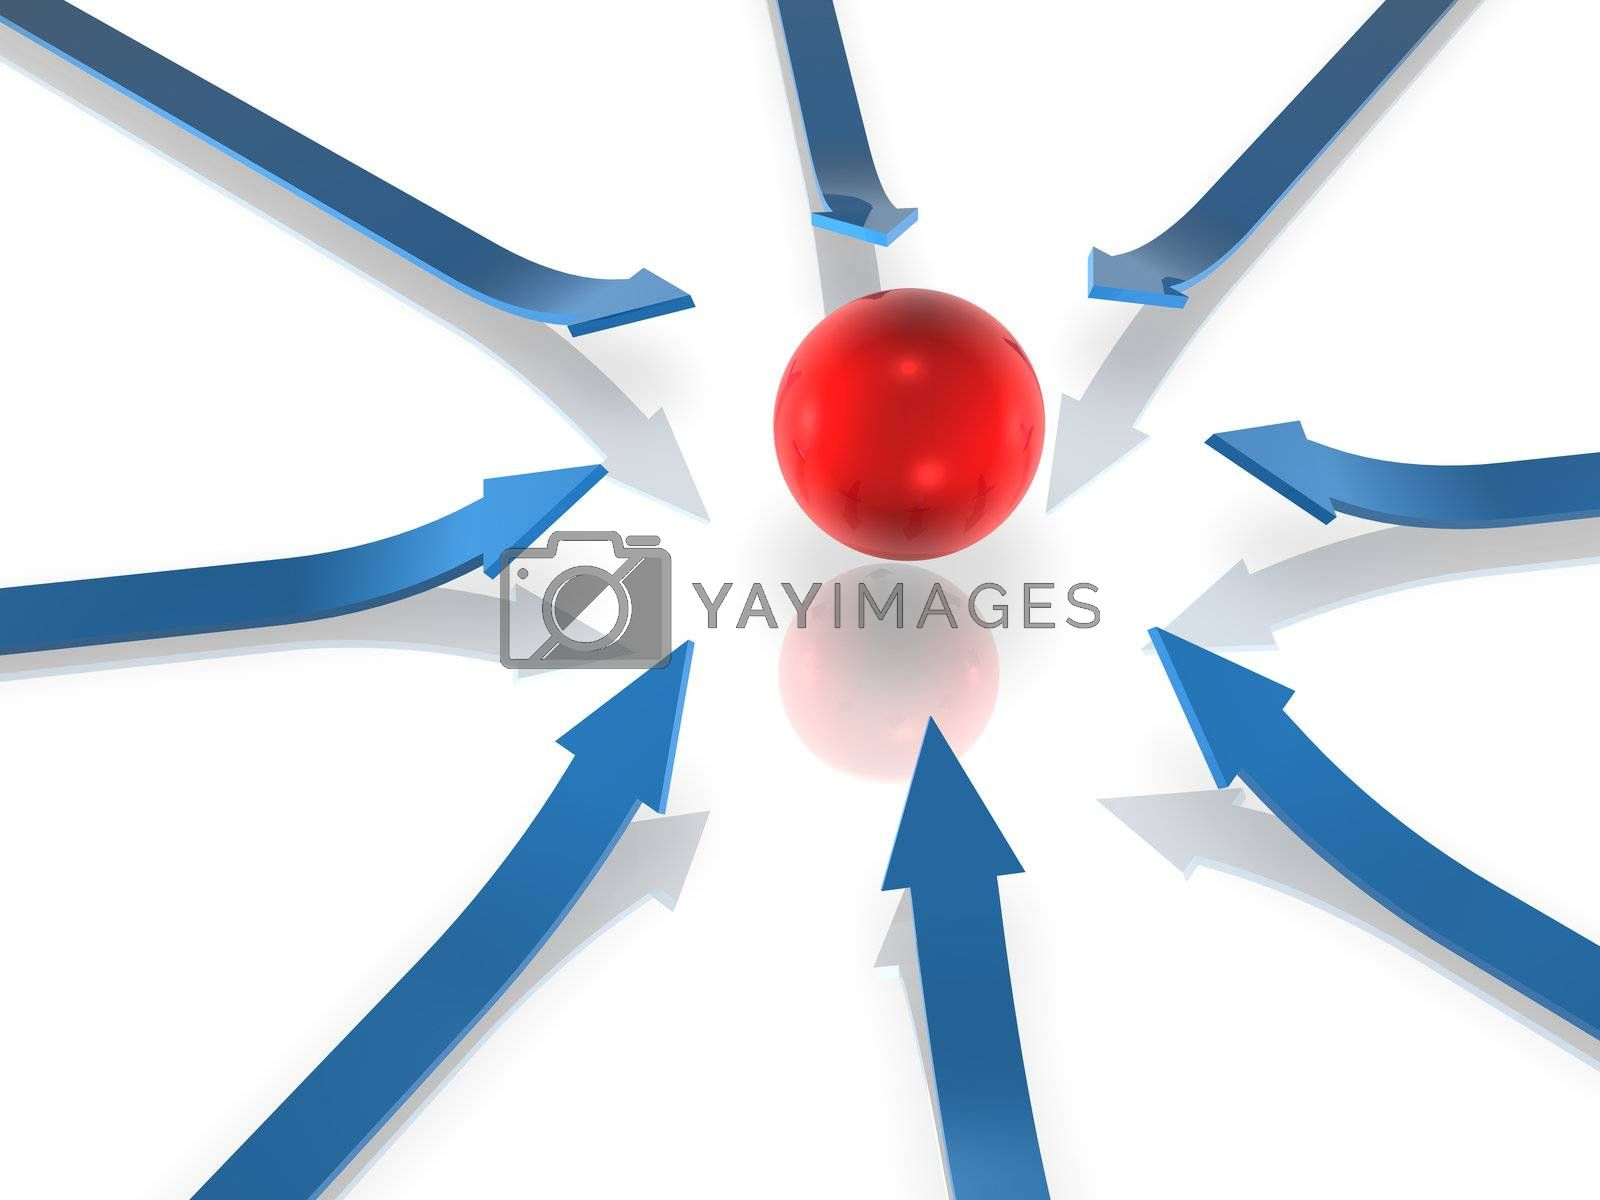 3D Render. Business Concept: Objectives.